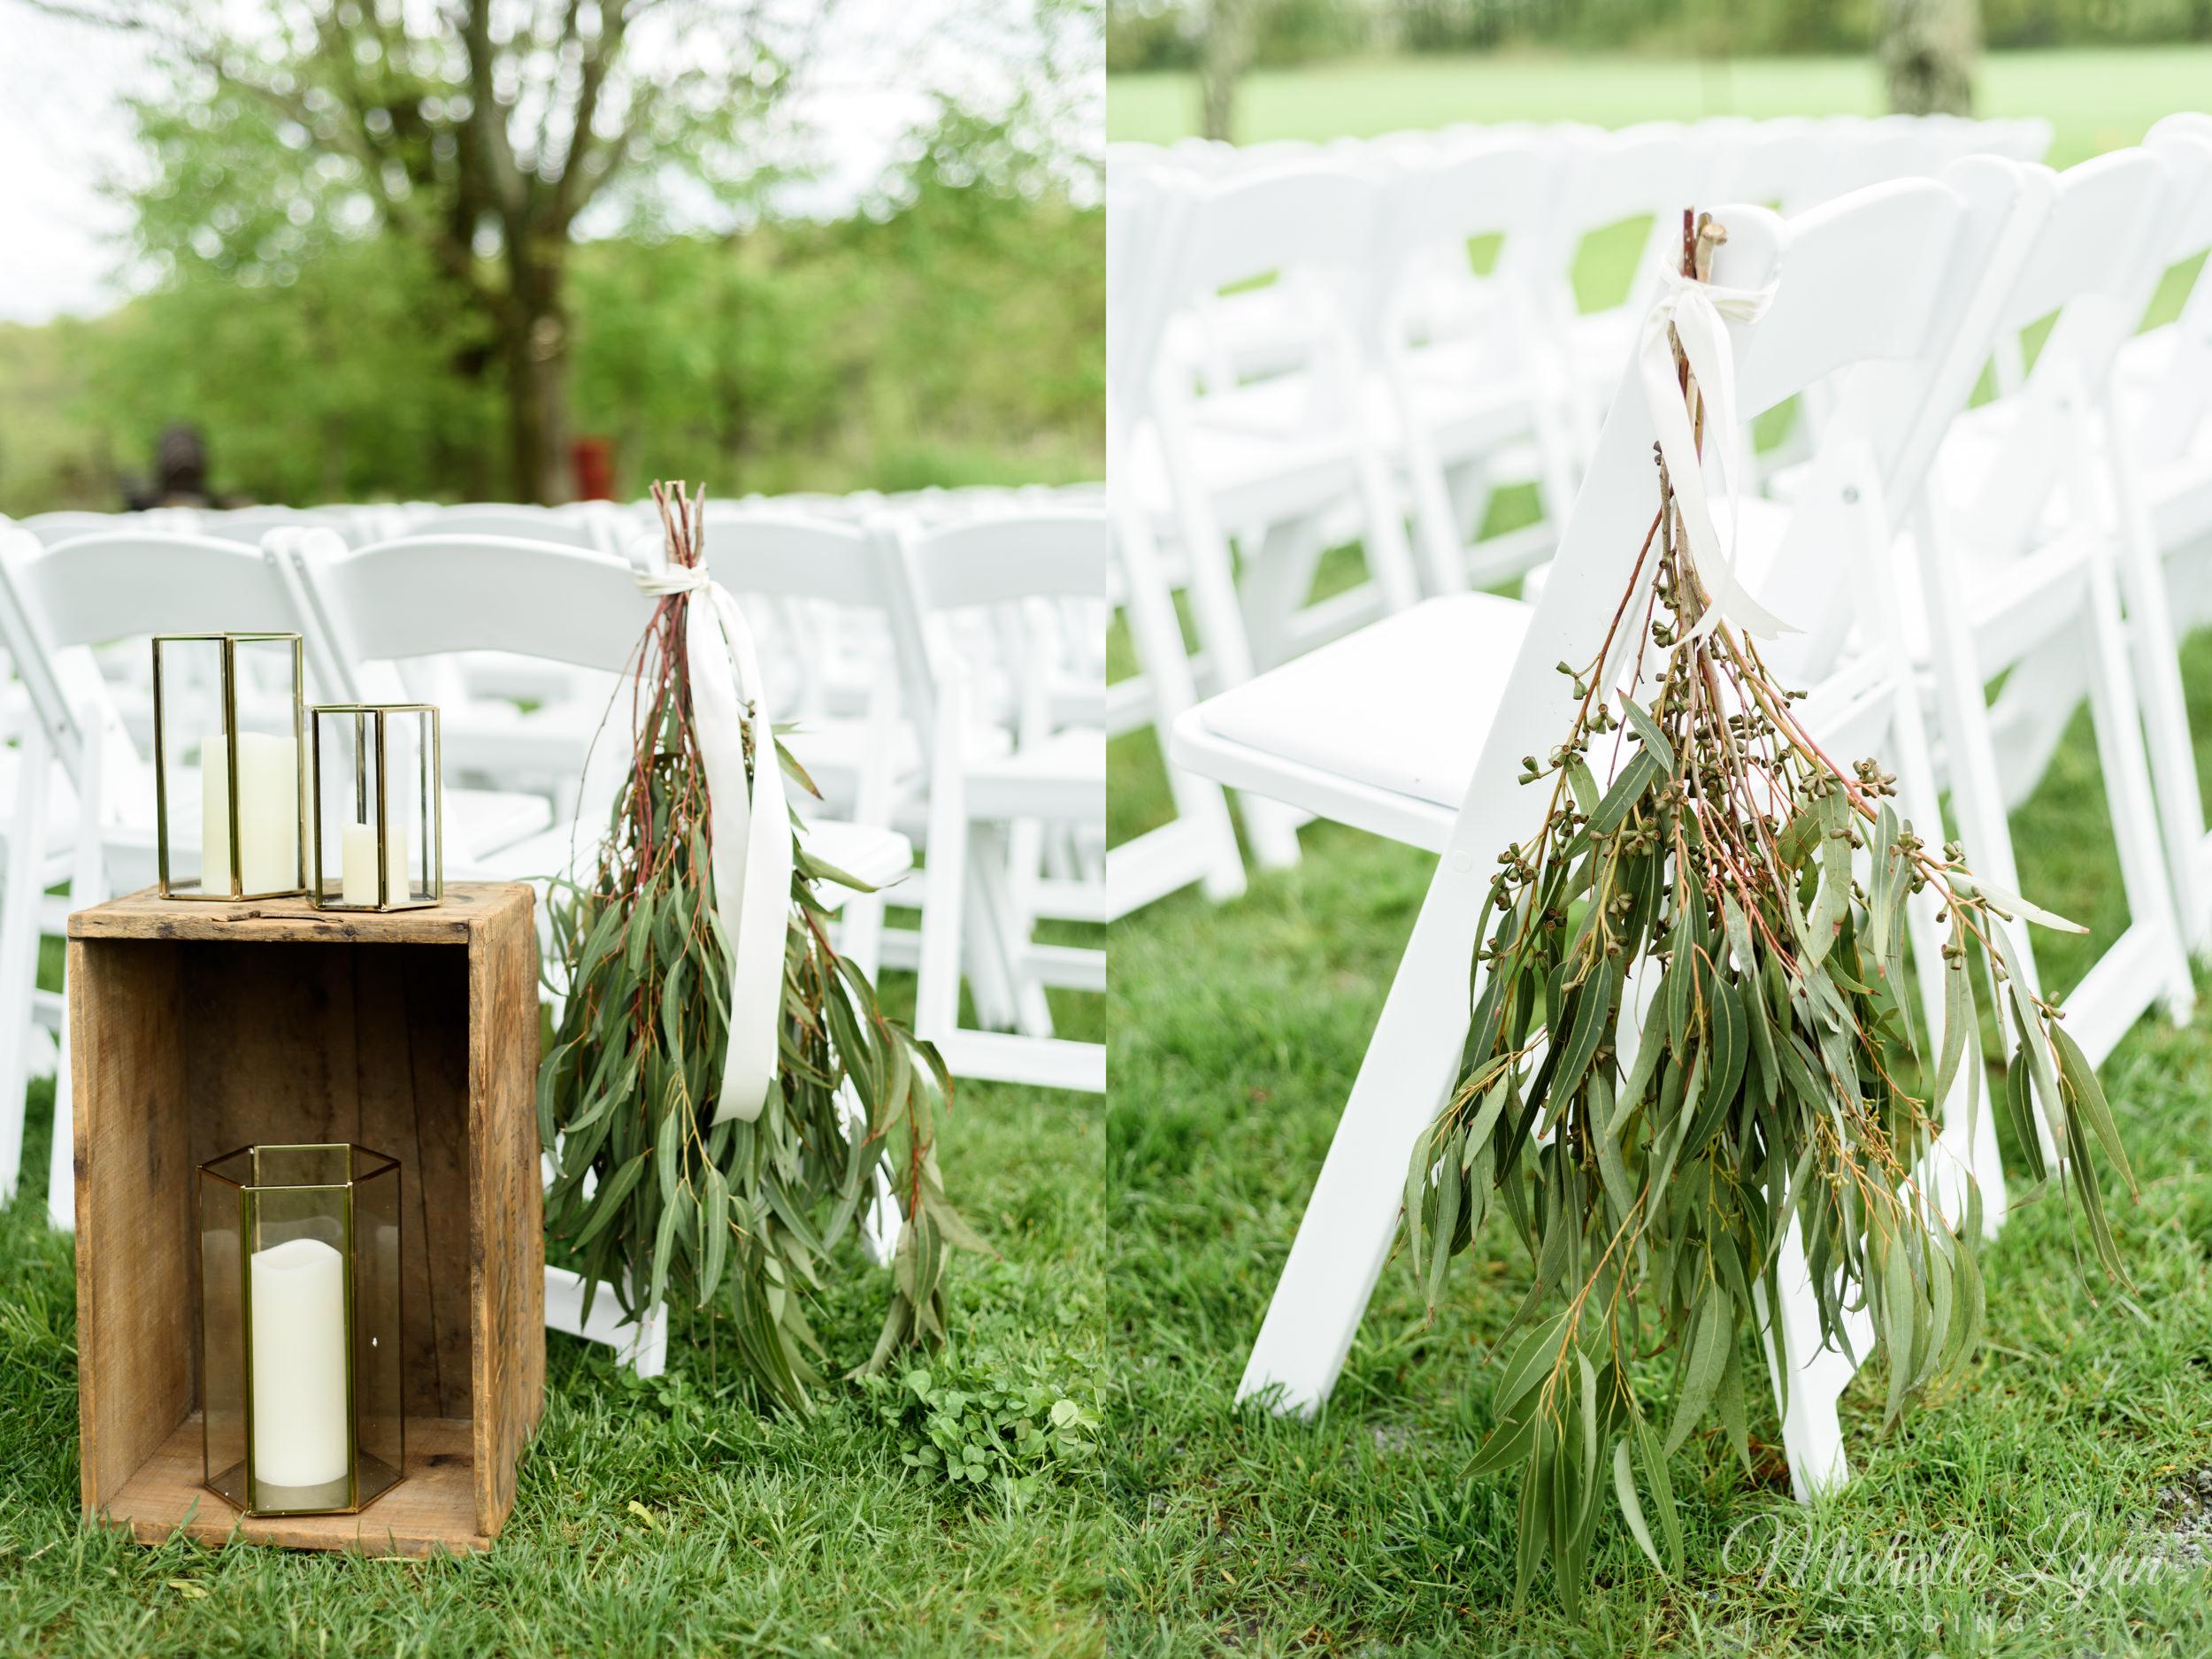 mlw-the-farm-bakery-and-events-wedding-photos-28.jpg